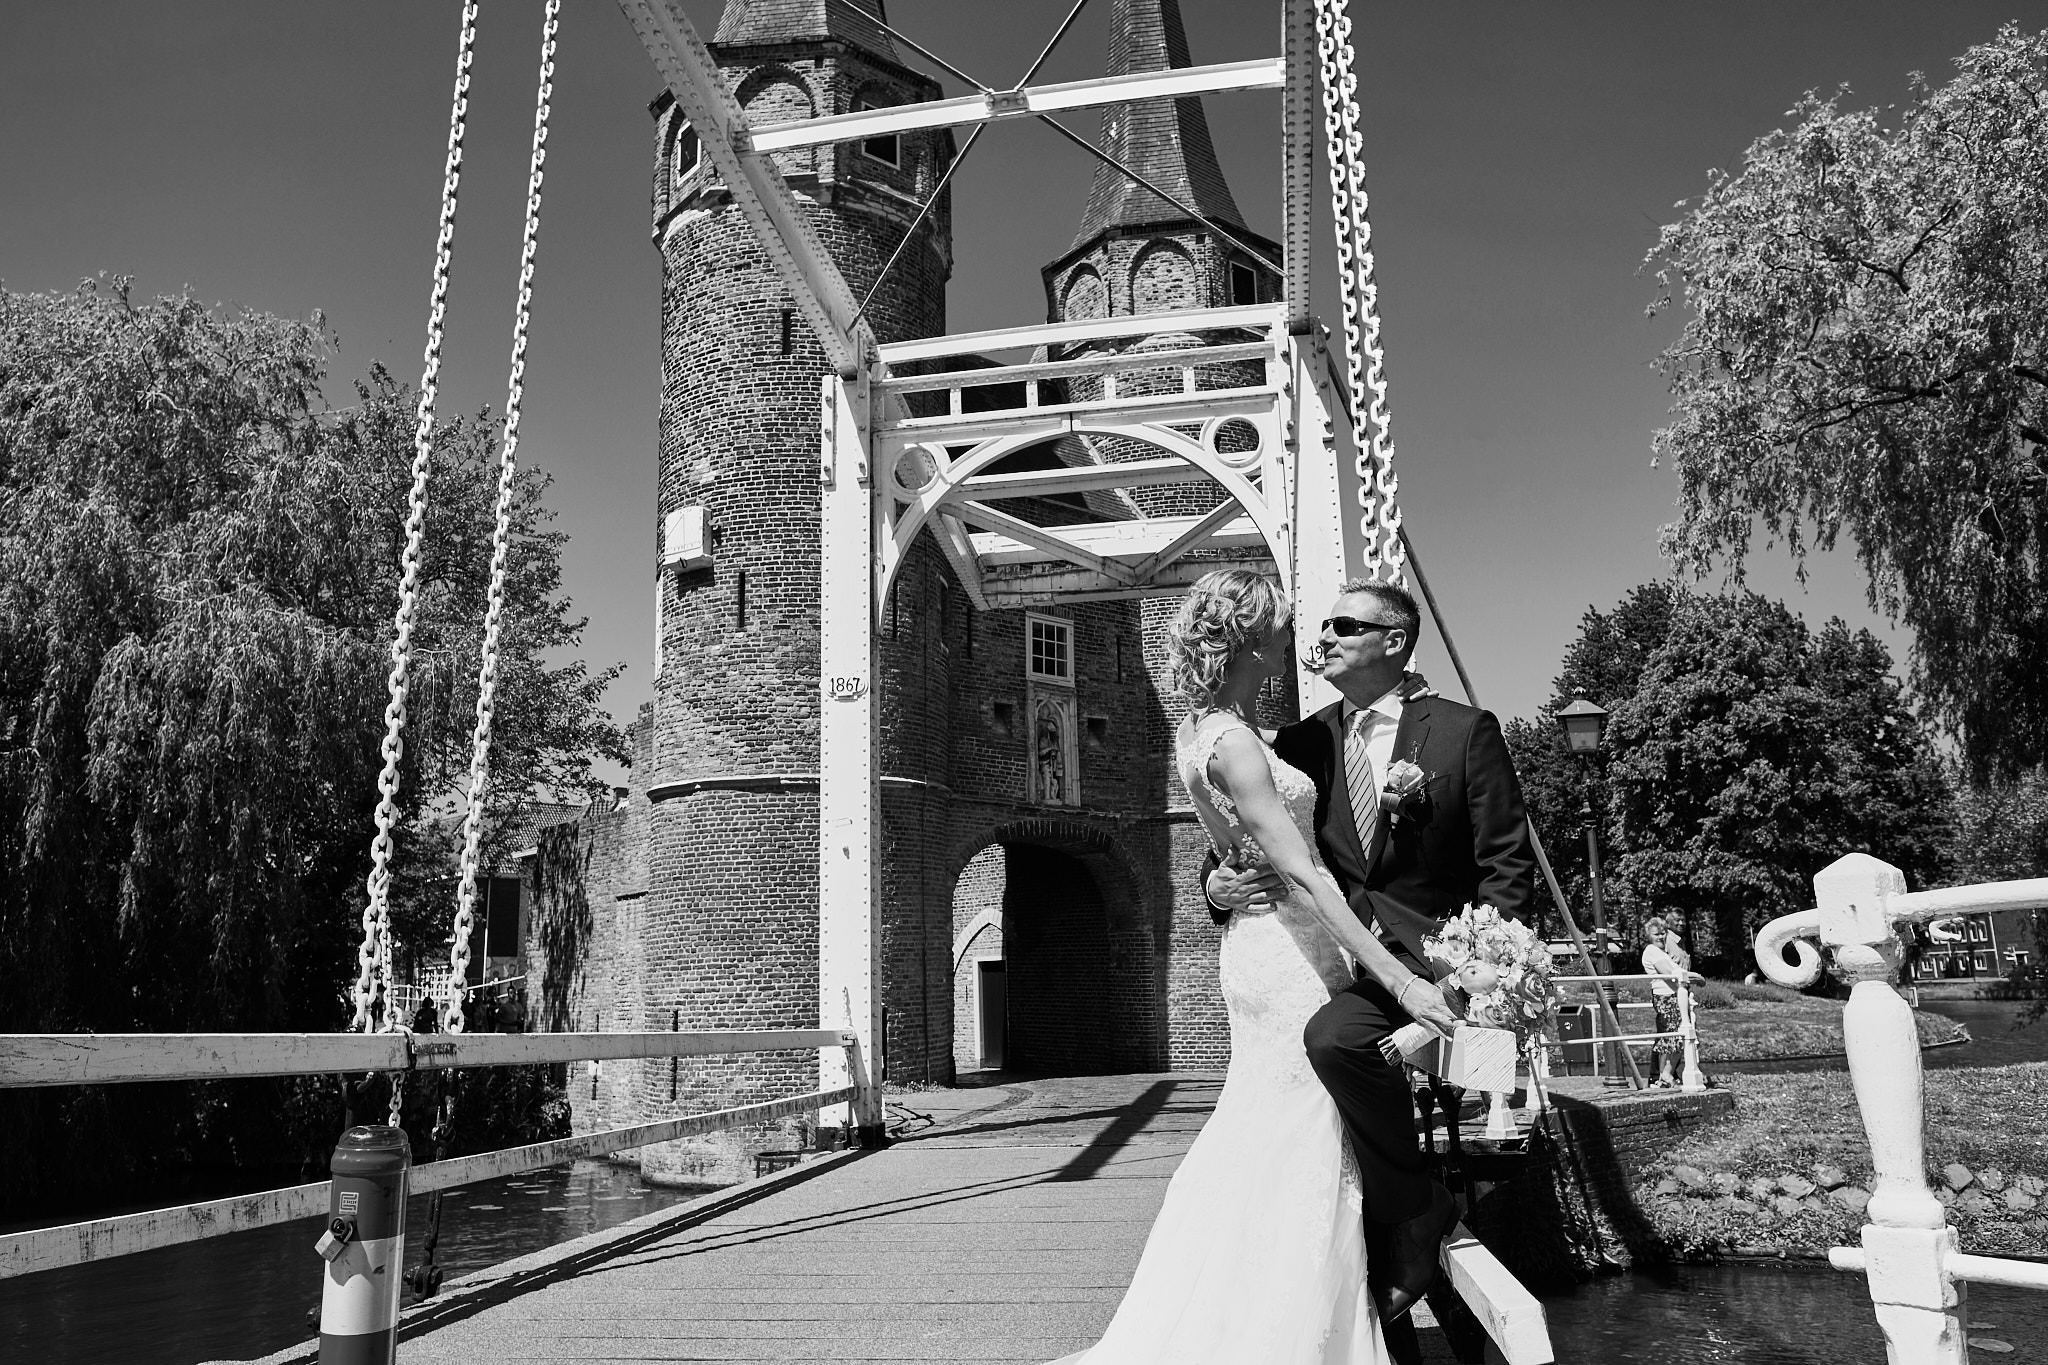 bruidsfotografie-trouwreportage-Delft-Ingrid-Richard_1430.jpg